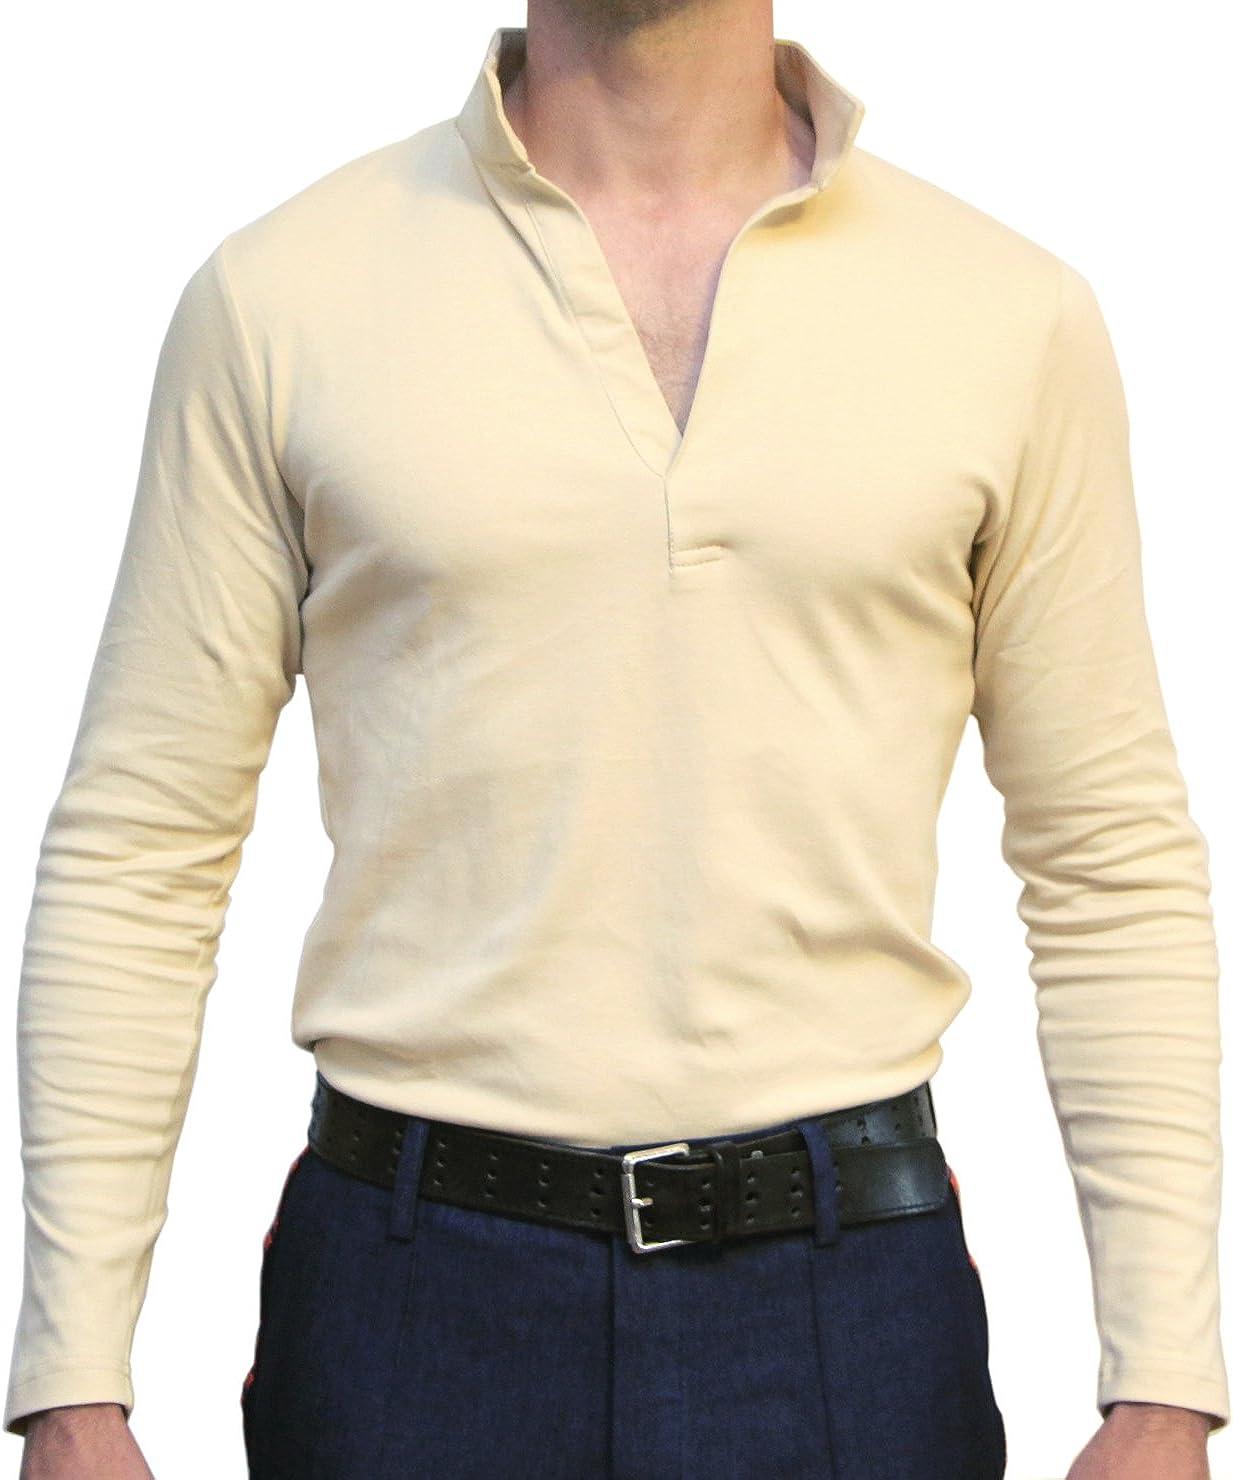 Magnoli Clothiers Han Solo Style Falcon Shirt Star Wars Cosplay